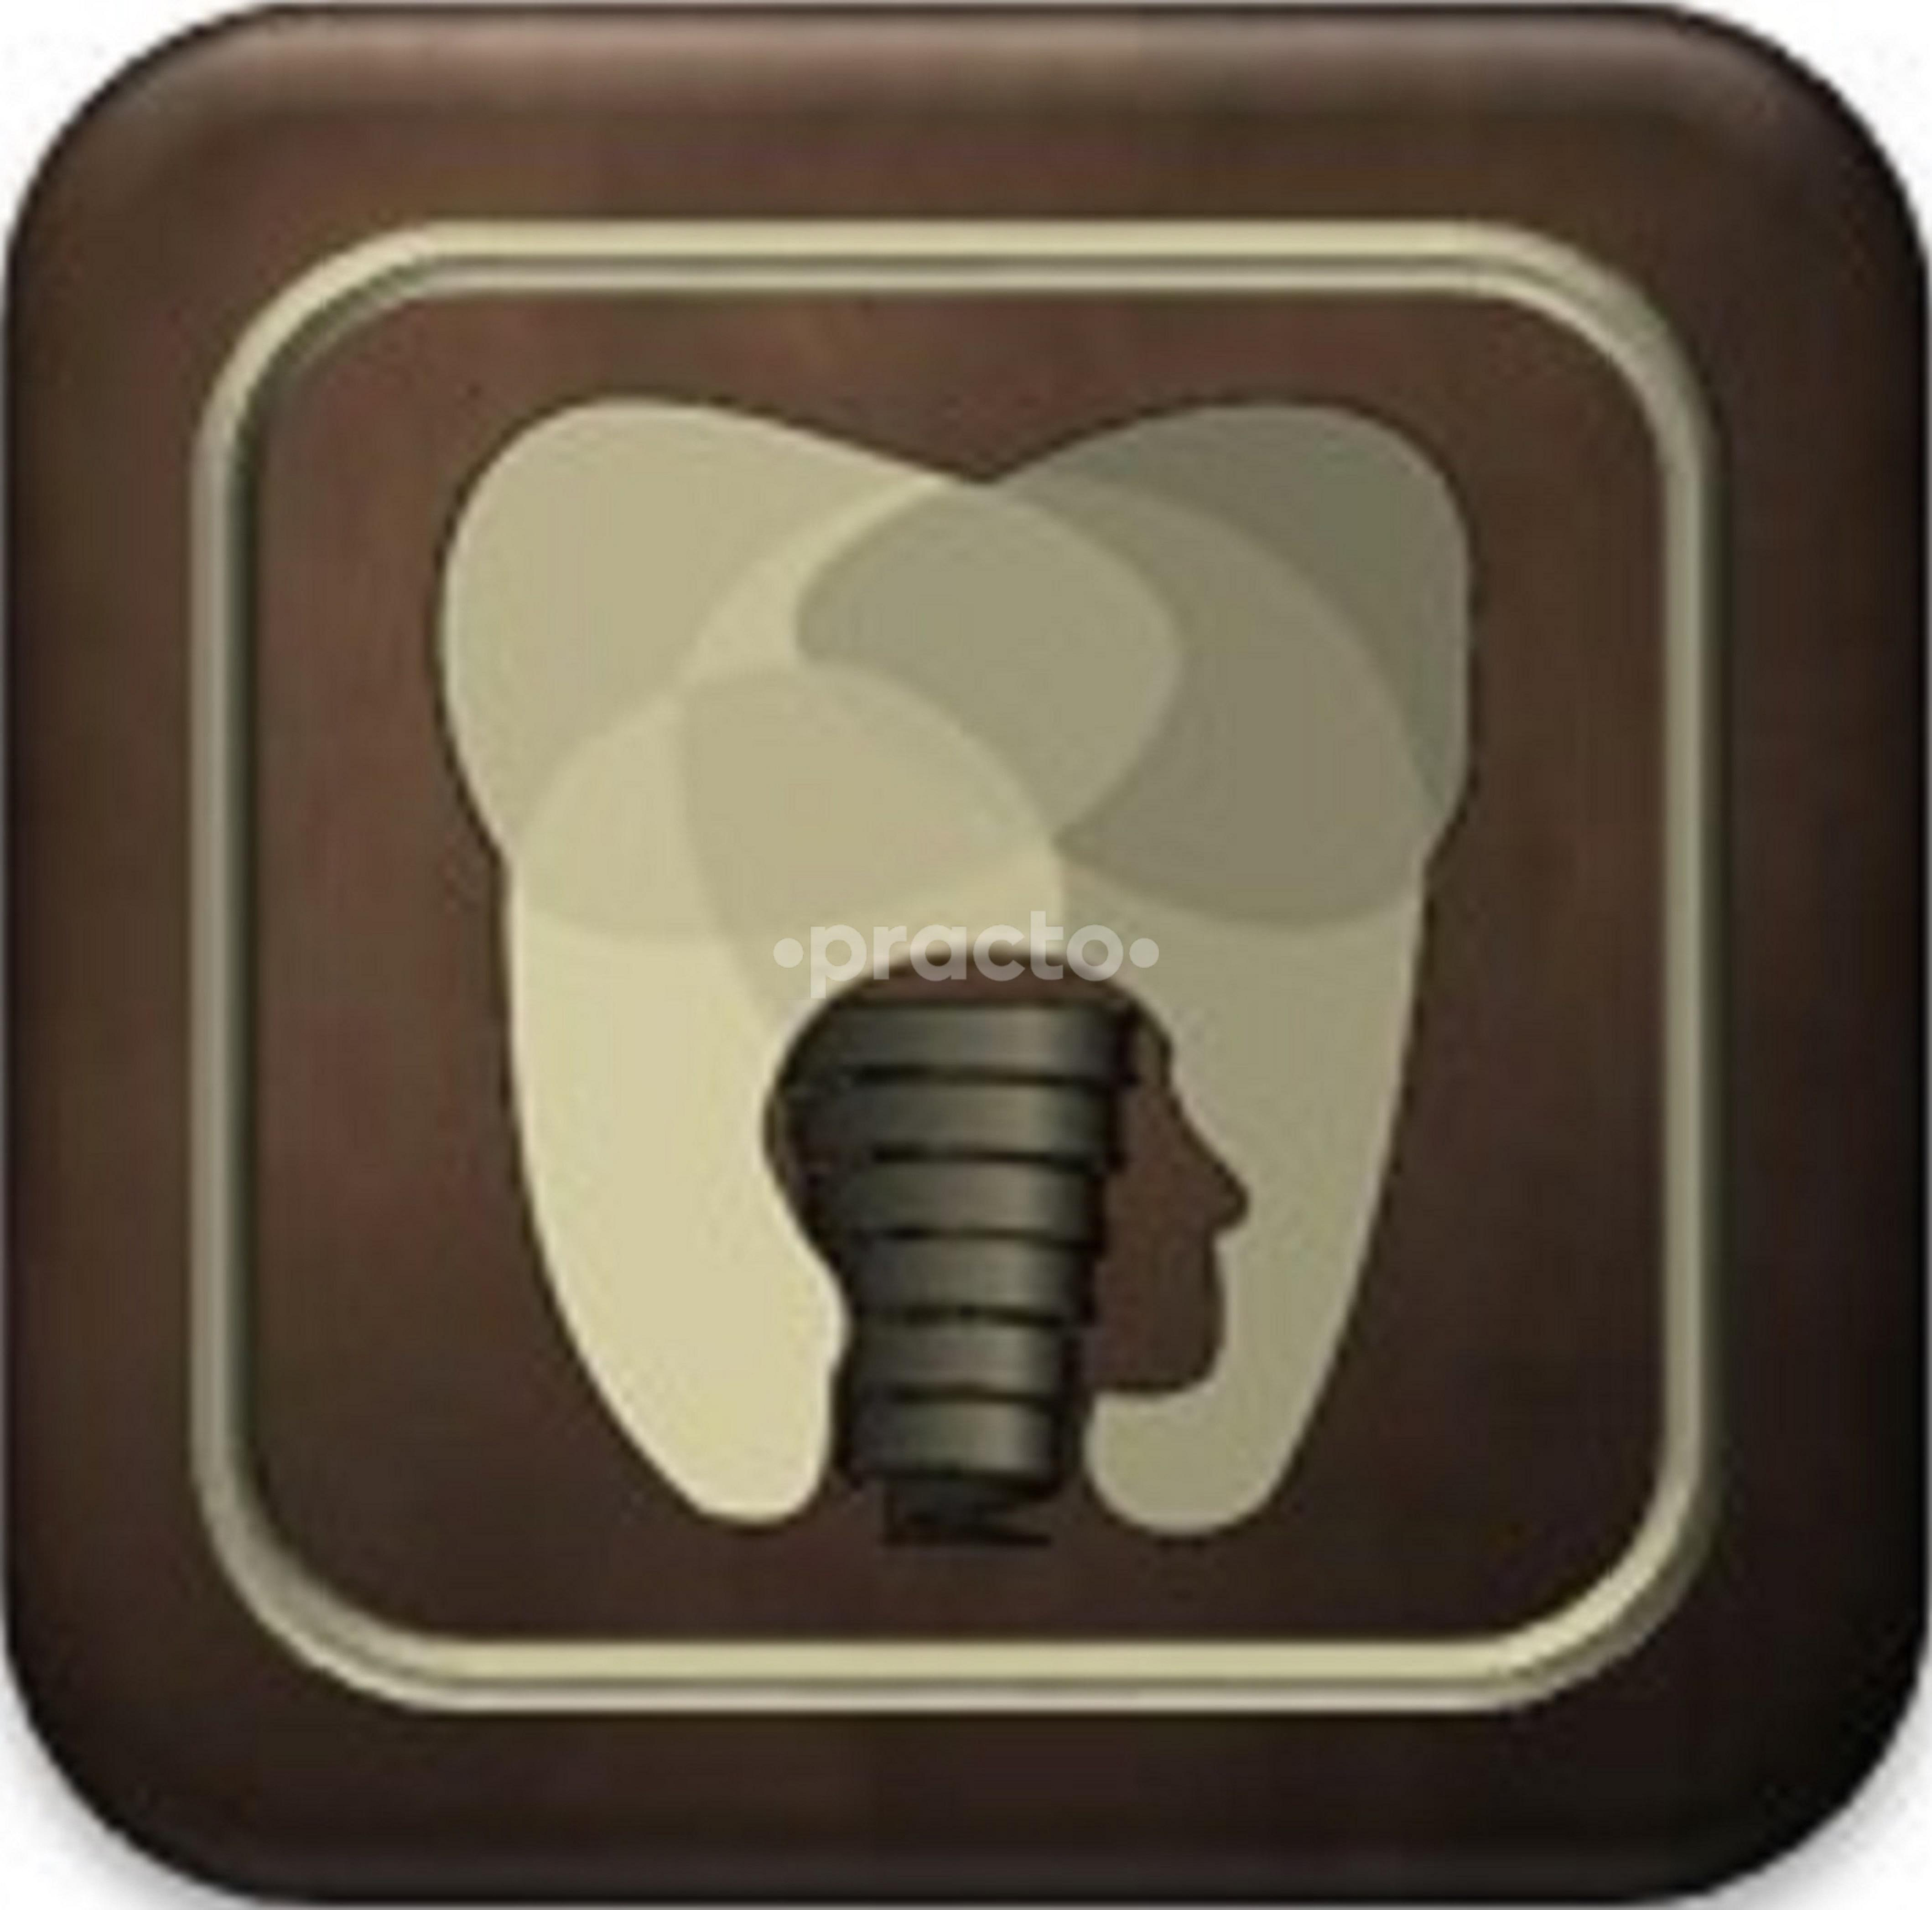 EndoMax Multi-specialilty Dental Clinic